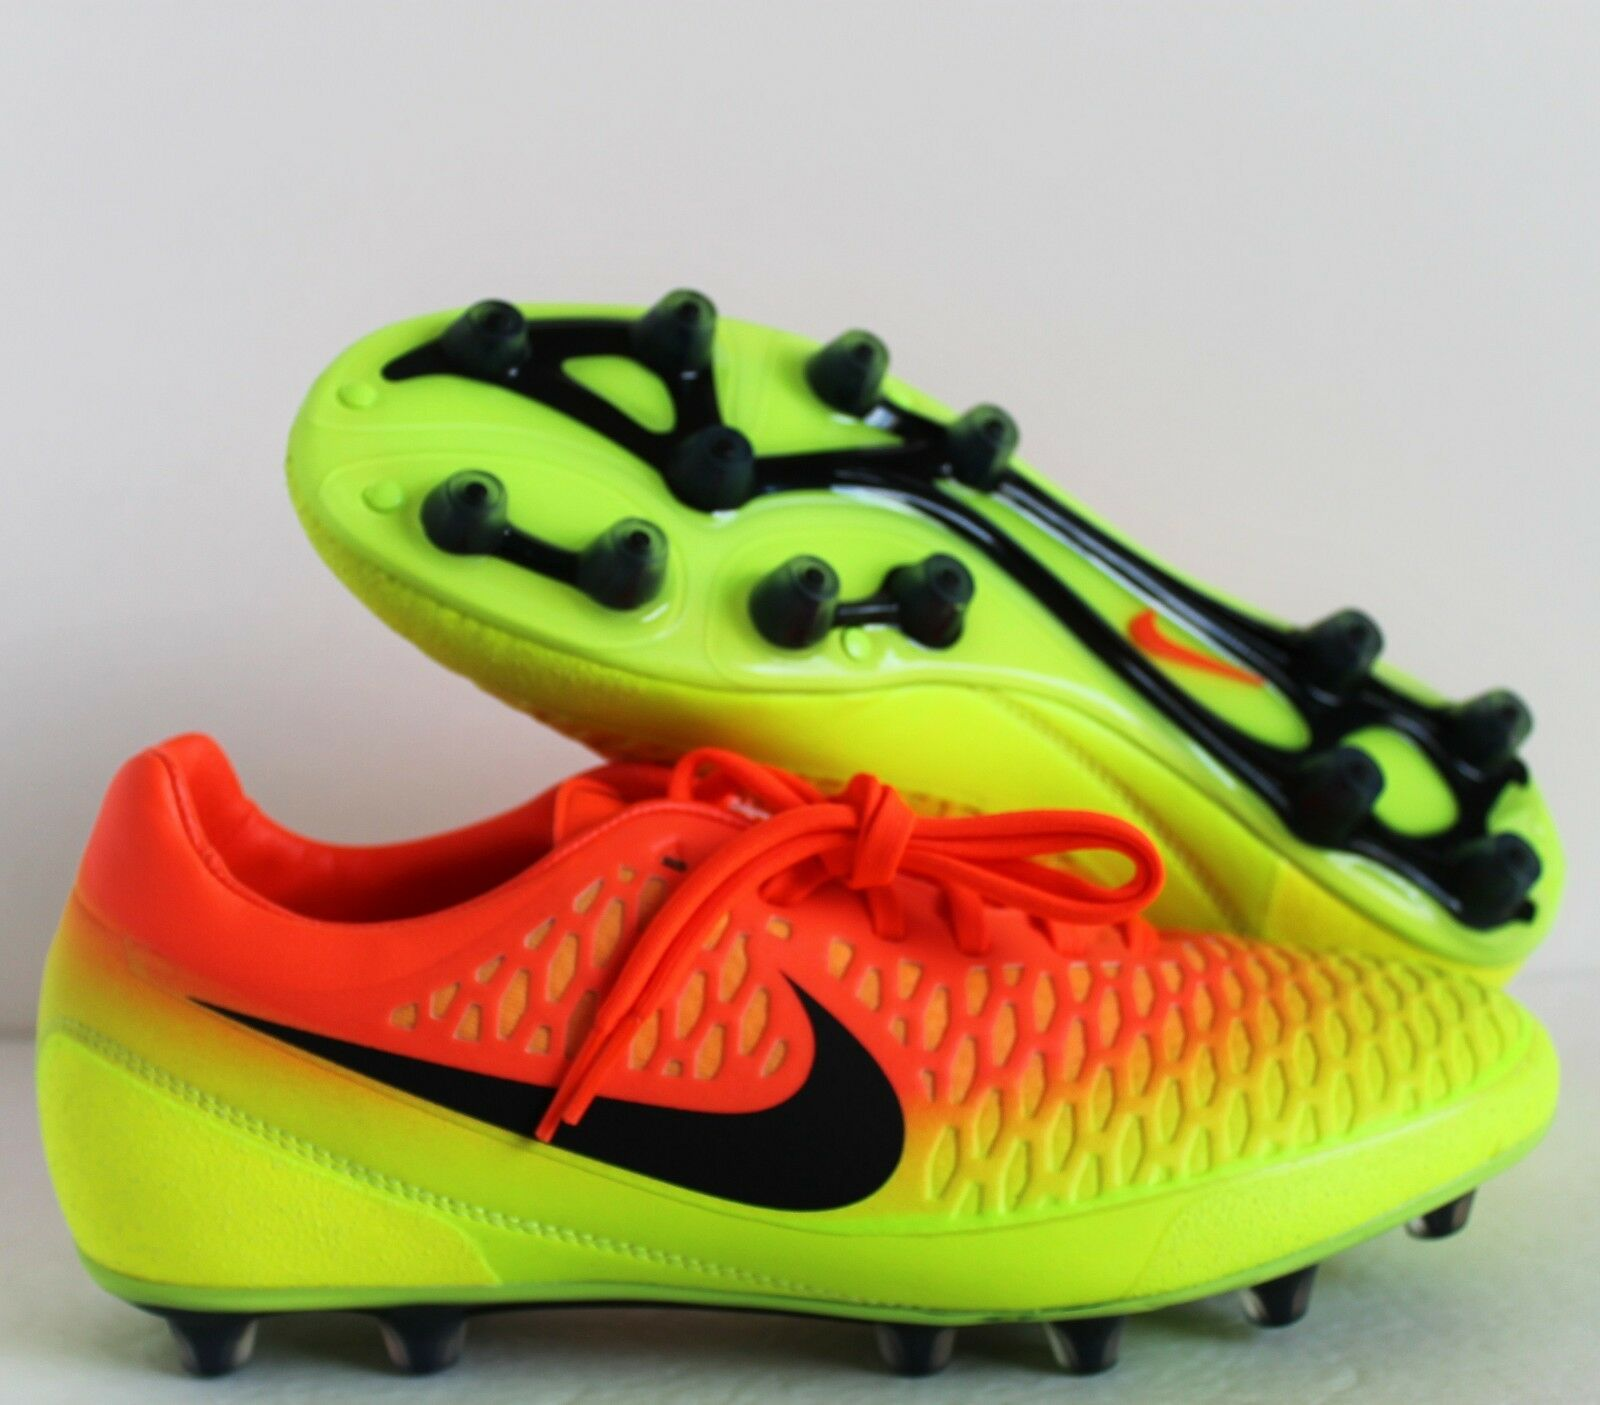 Nike Magista Opus HG-E Soccer Cleats Volt-orange-Black sz 9 [649231-807]